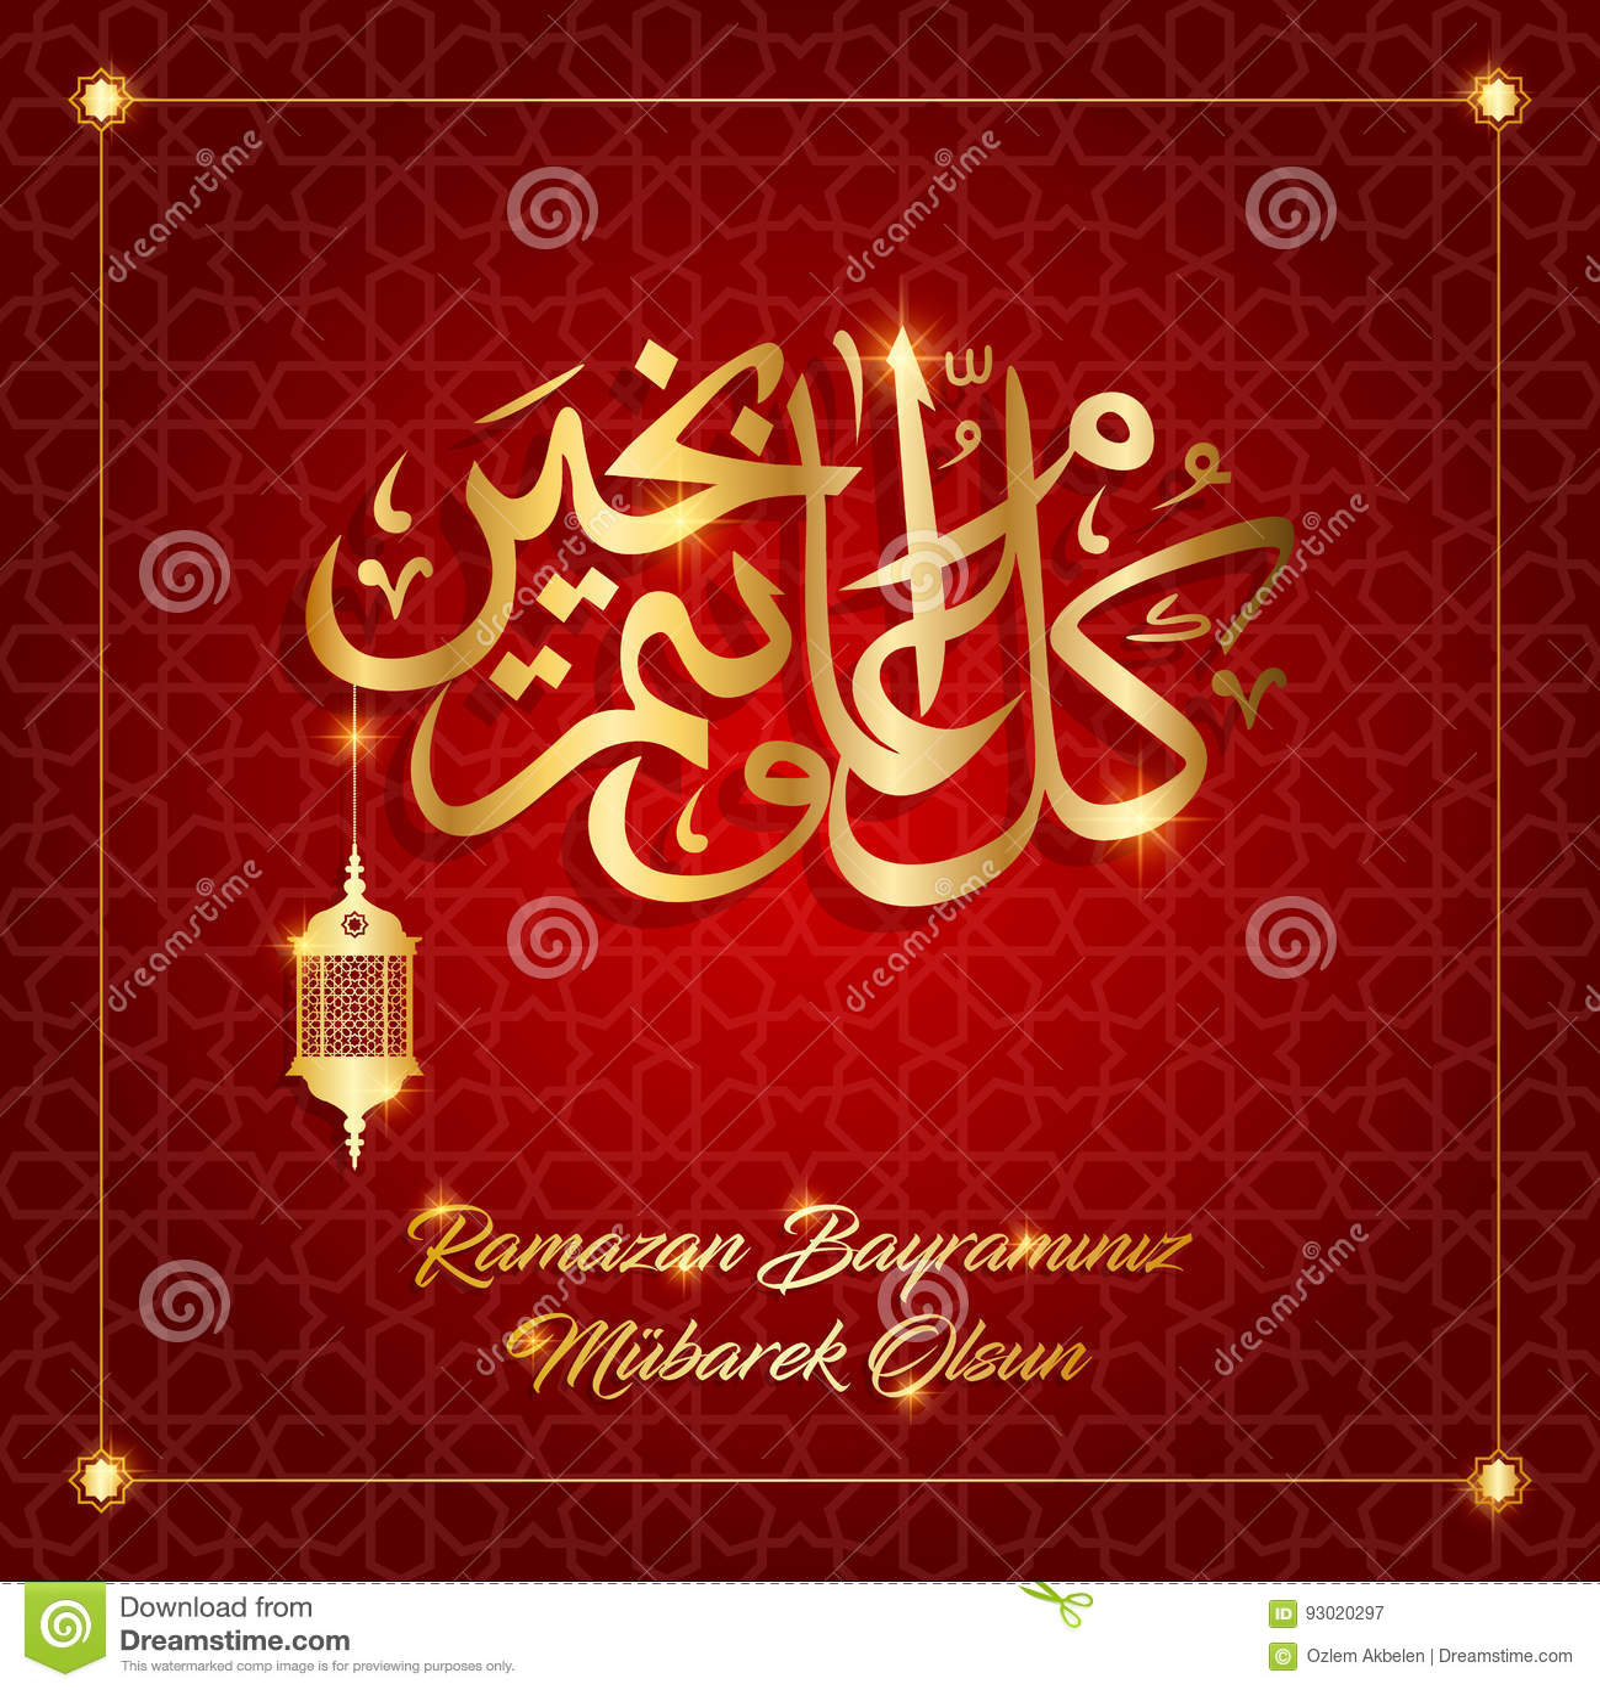 Ramazan bayrami vector illustration stock vector illustration of ramazan bayrami vector illustration m4hsunfo